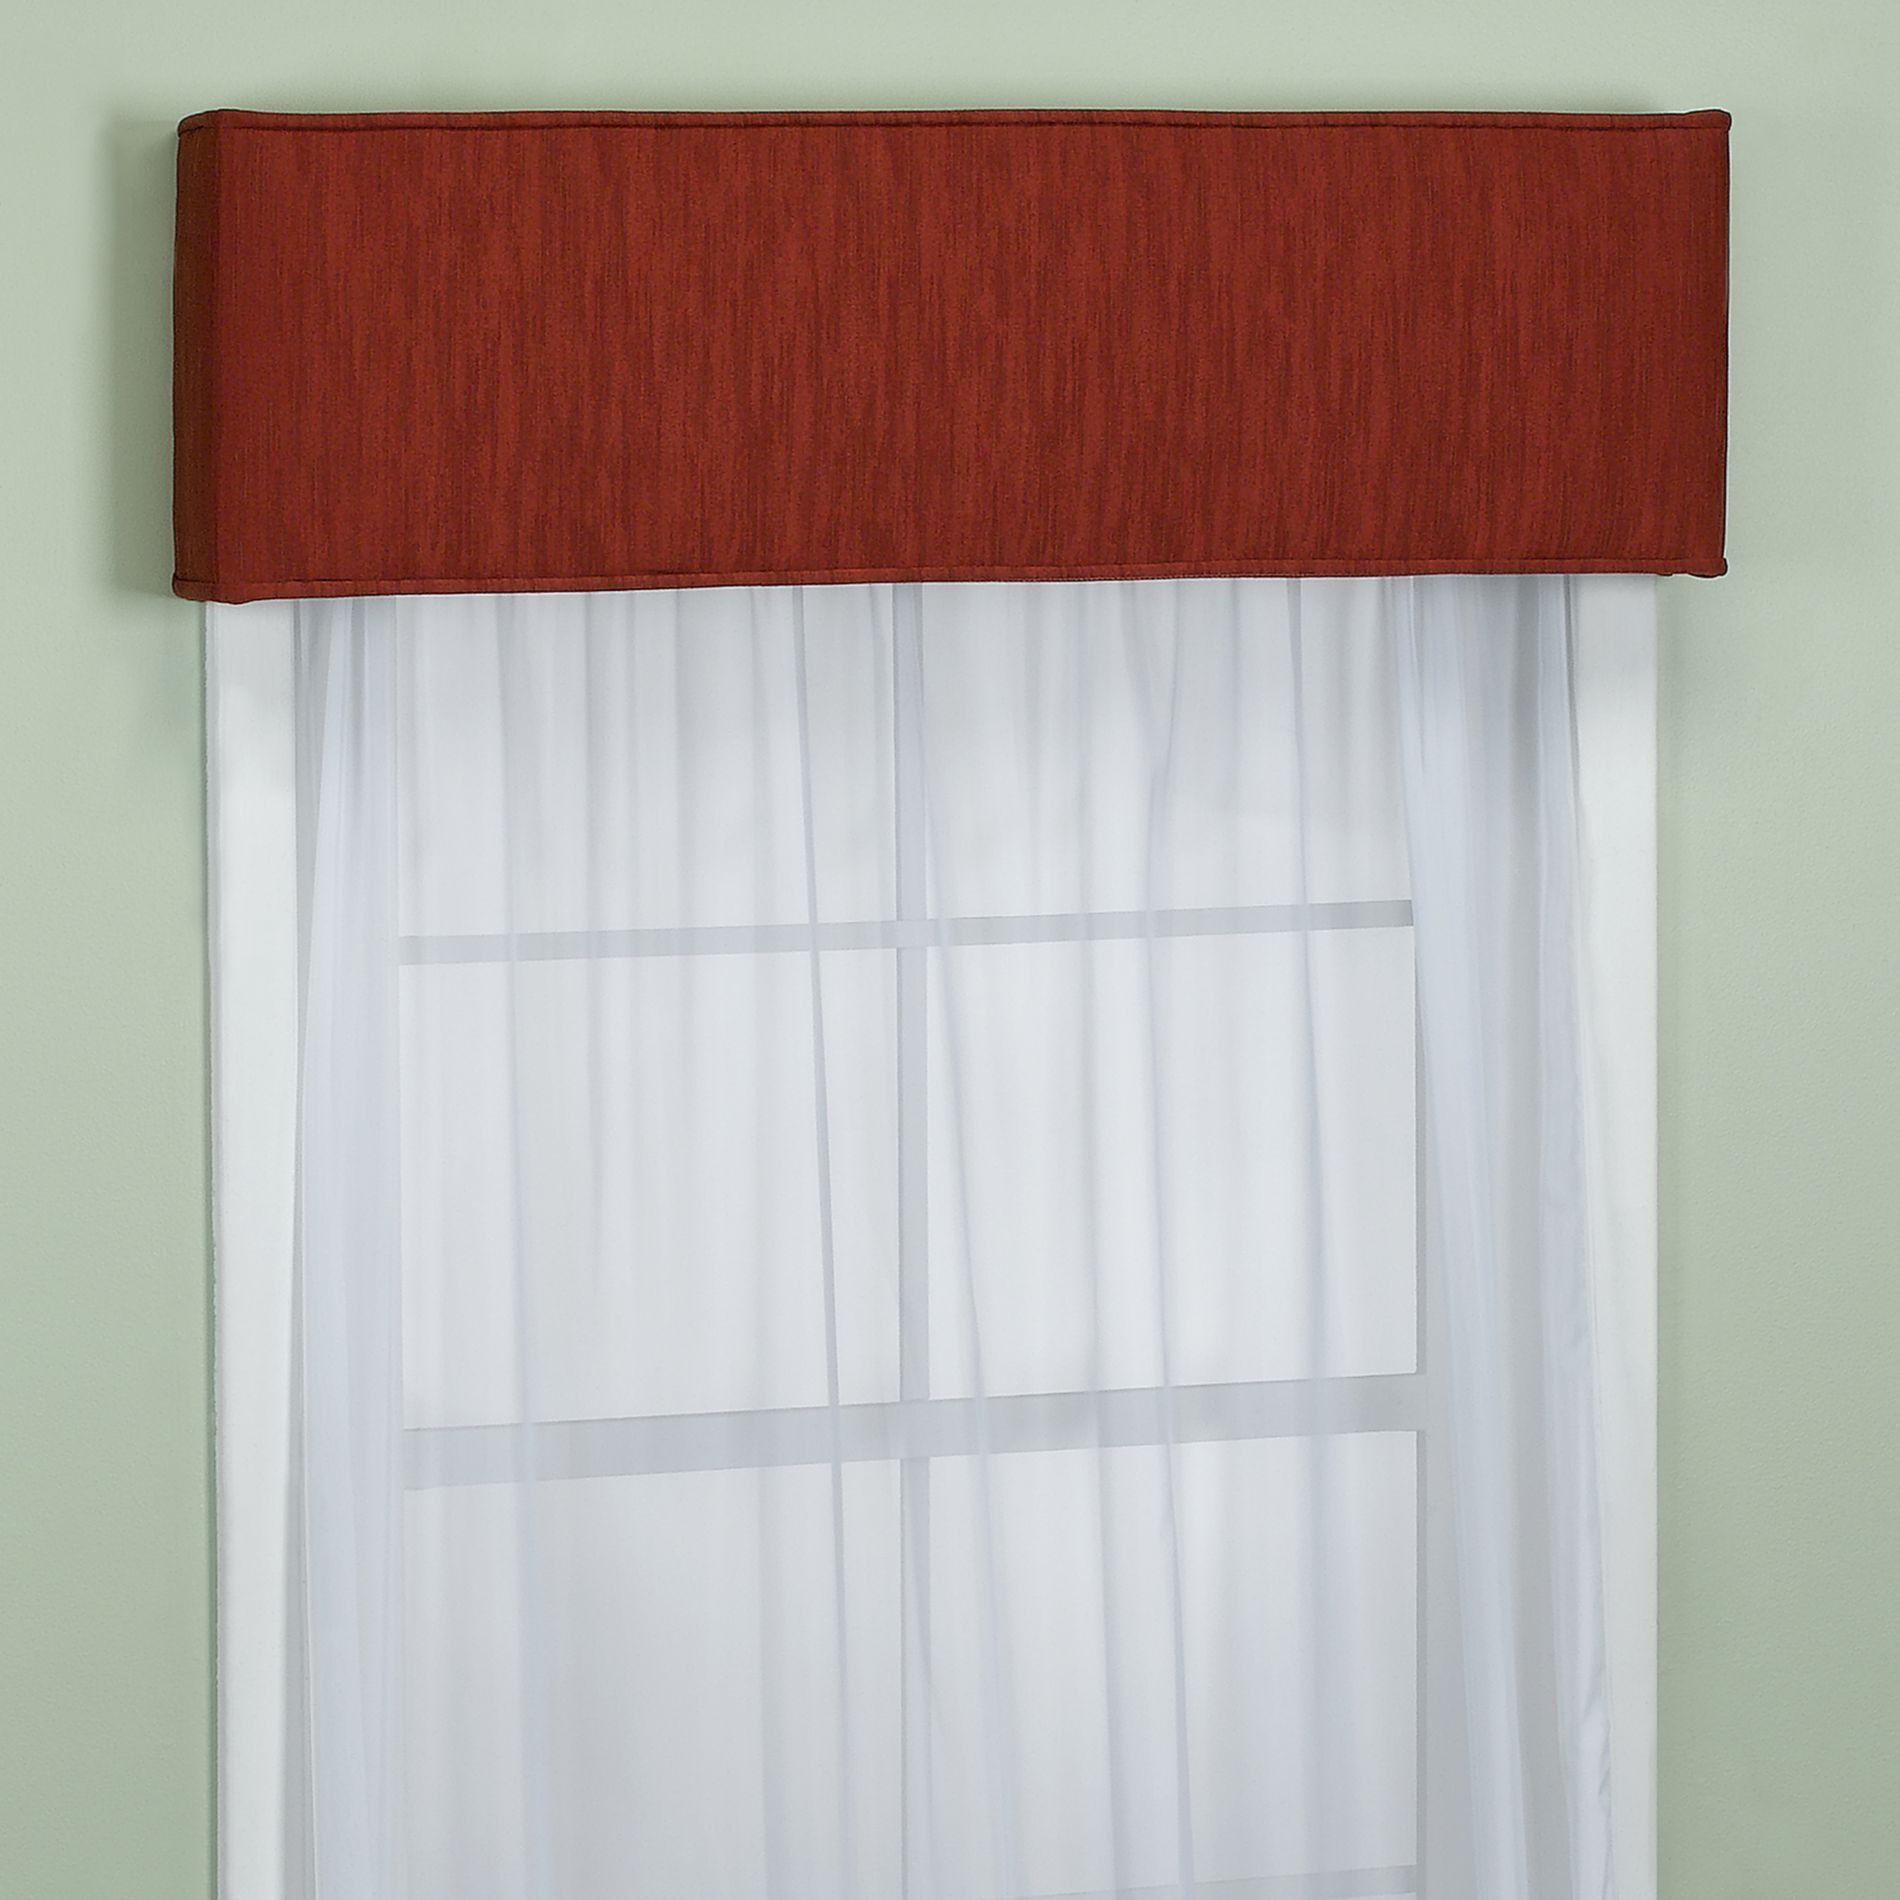 Bed bath and beyond window curtains  nicole window cornice in mahogany  bedbathandbeyond